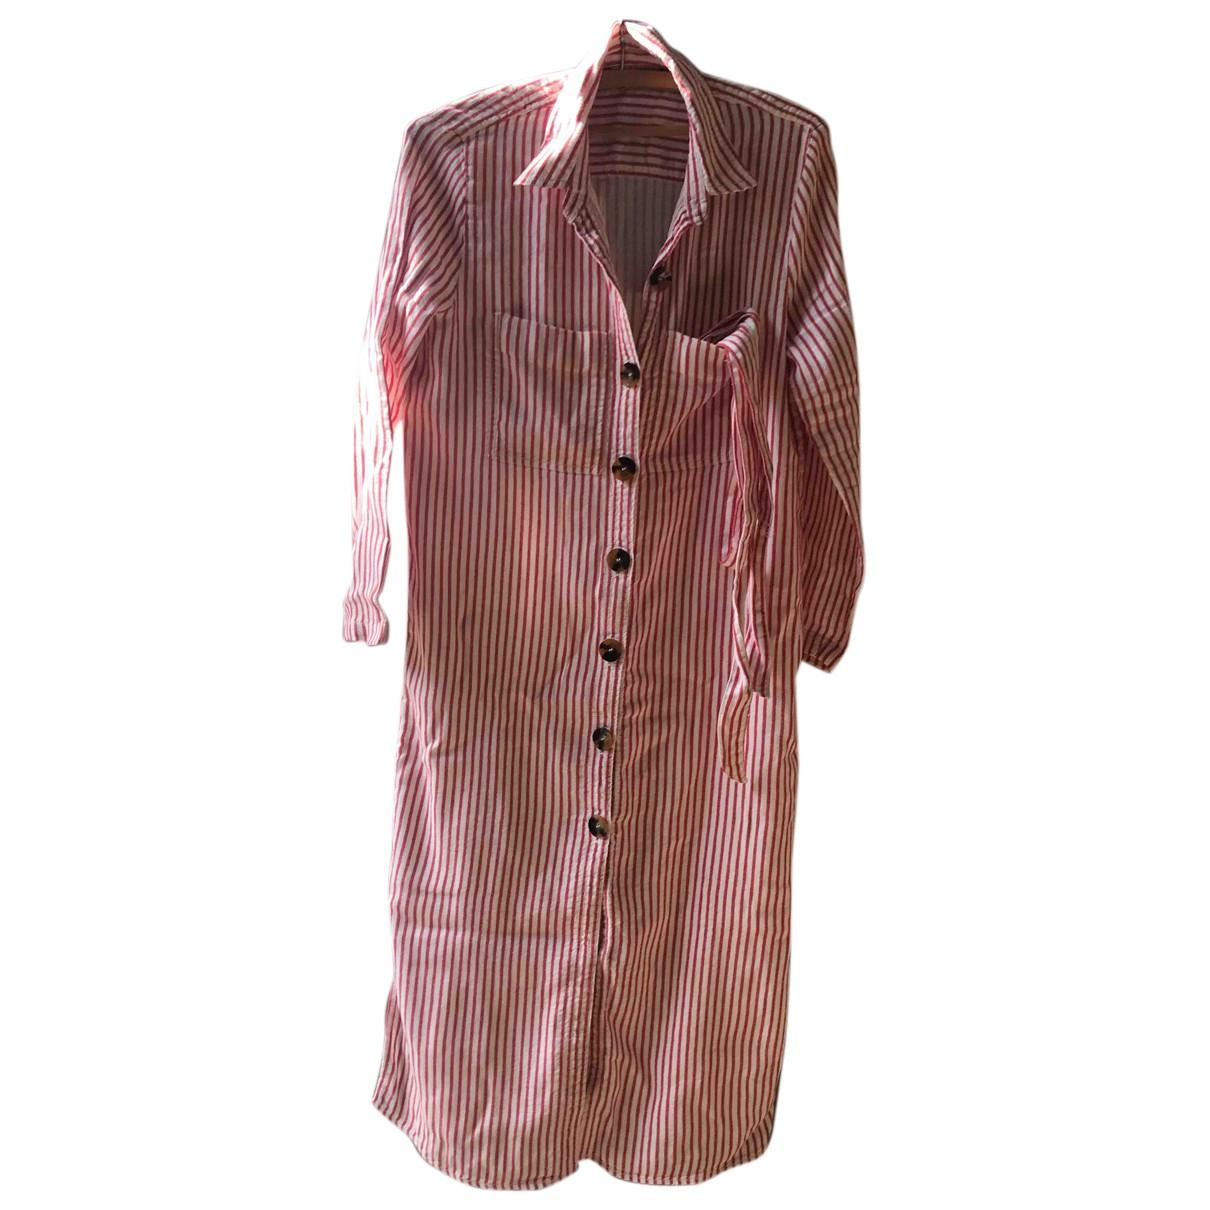 Zara - Robe   pour femme en coton - rouge